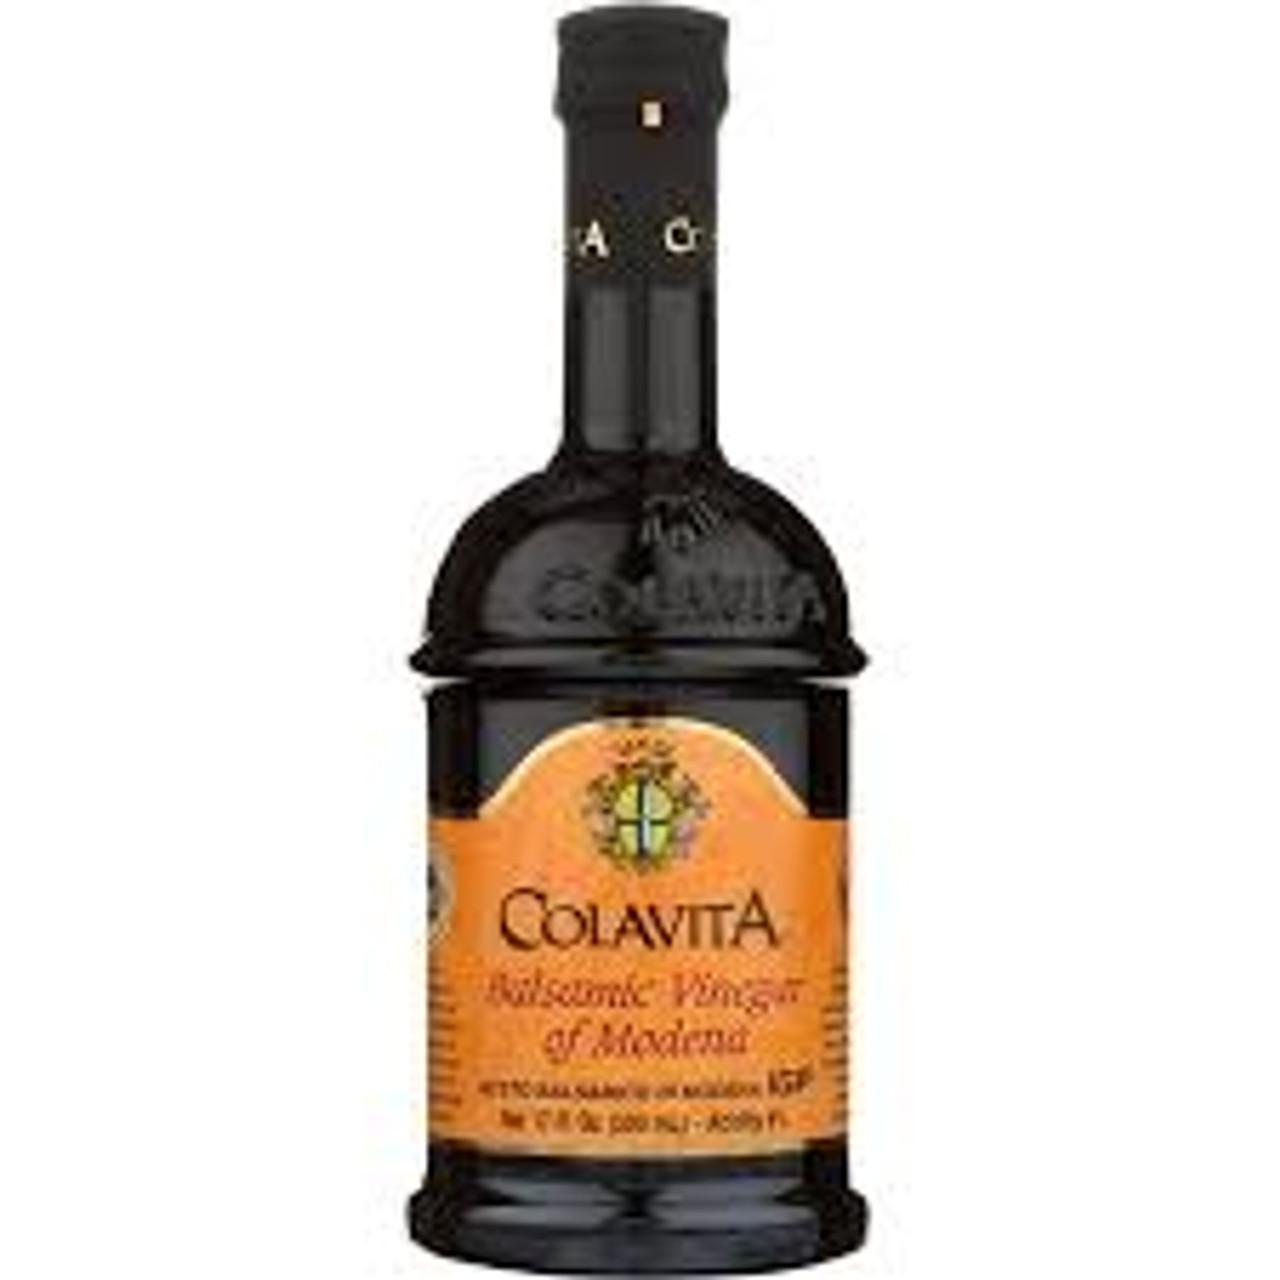 Colavita Balsamic Vinegar